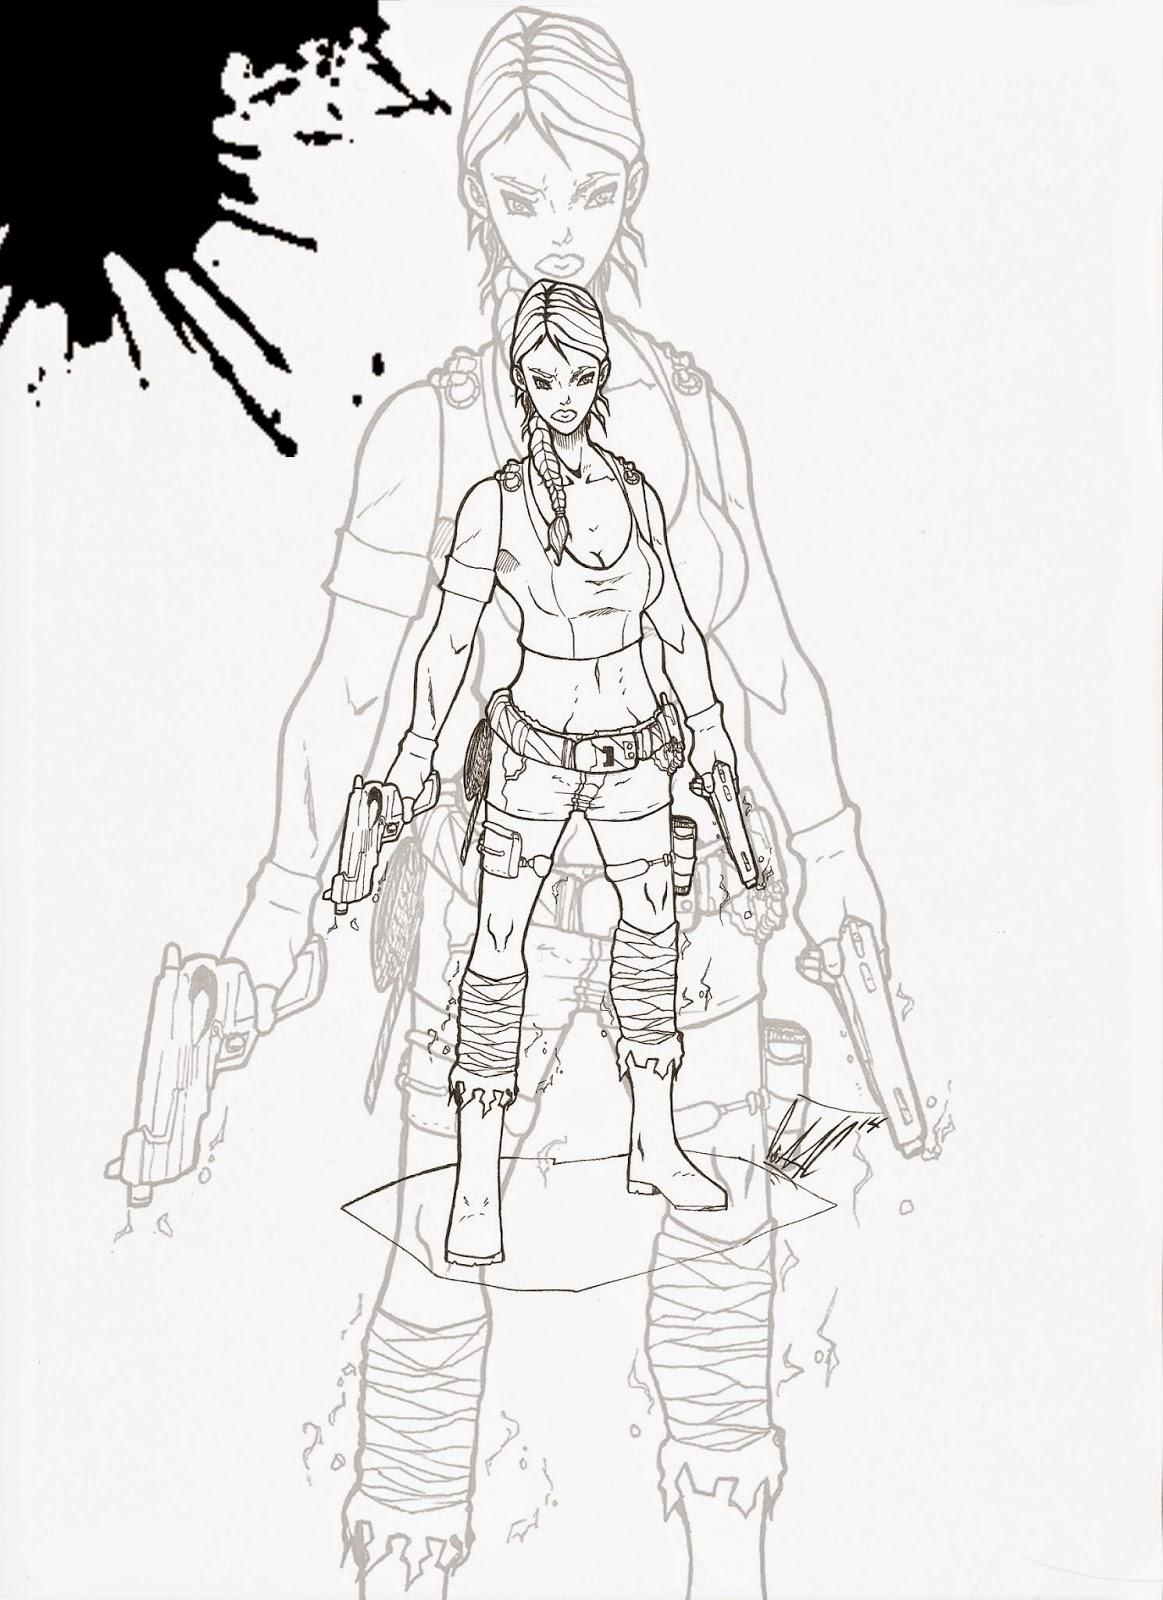 IsaacSanchez_Dibujando